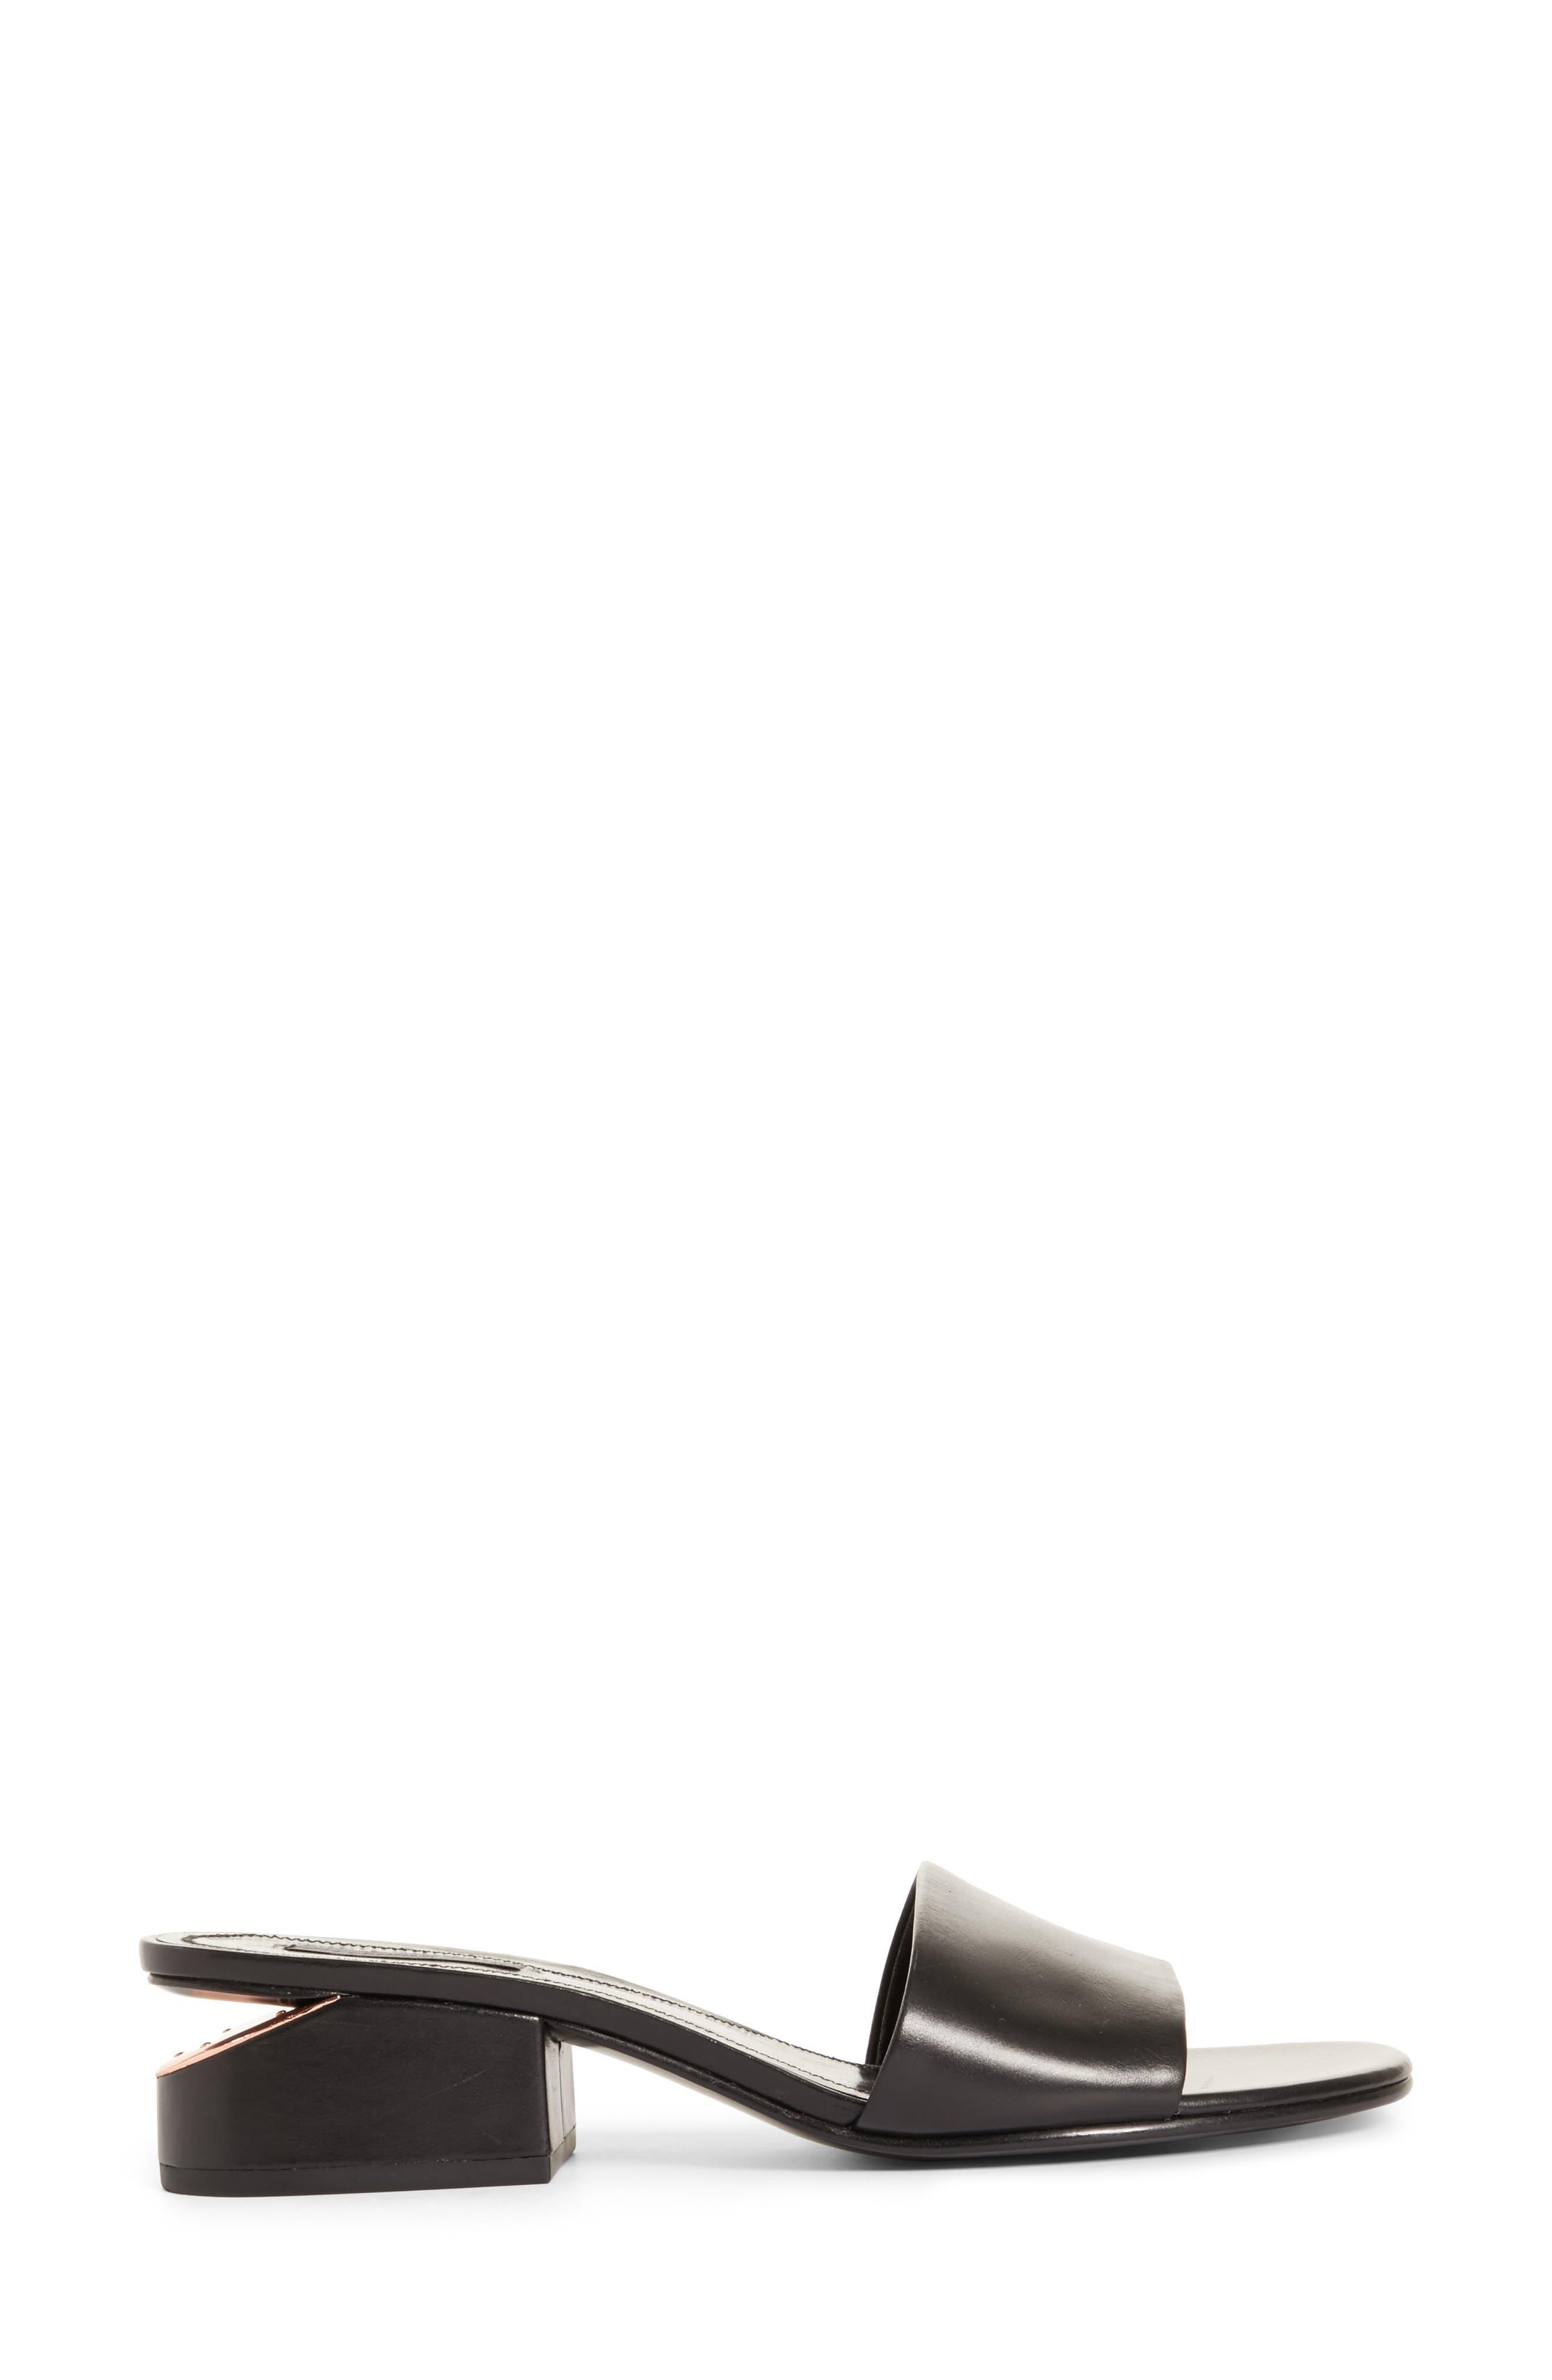 Lou Slide Sandal,                             Alternate thumbnail 3, color,                             BLACK/ ROSE GOLD